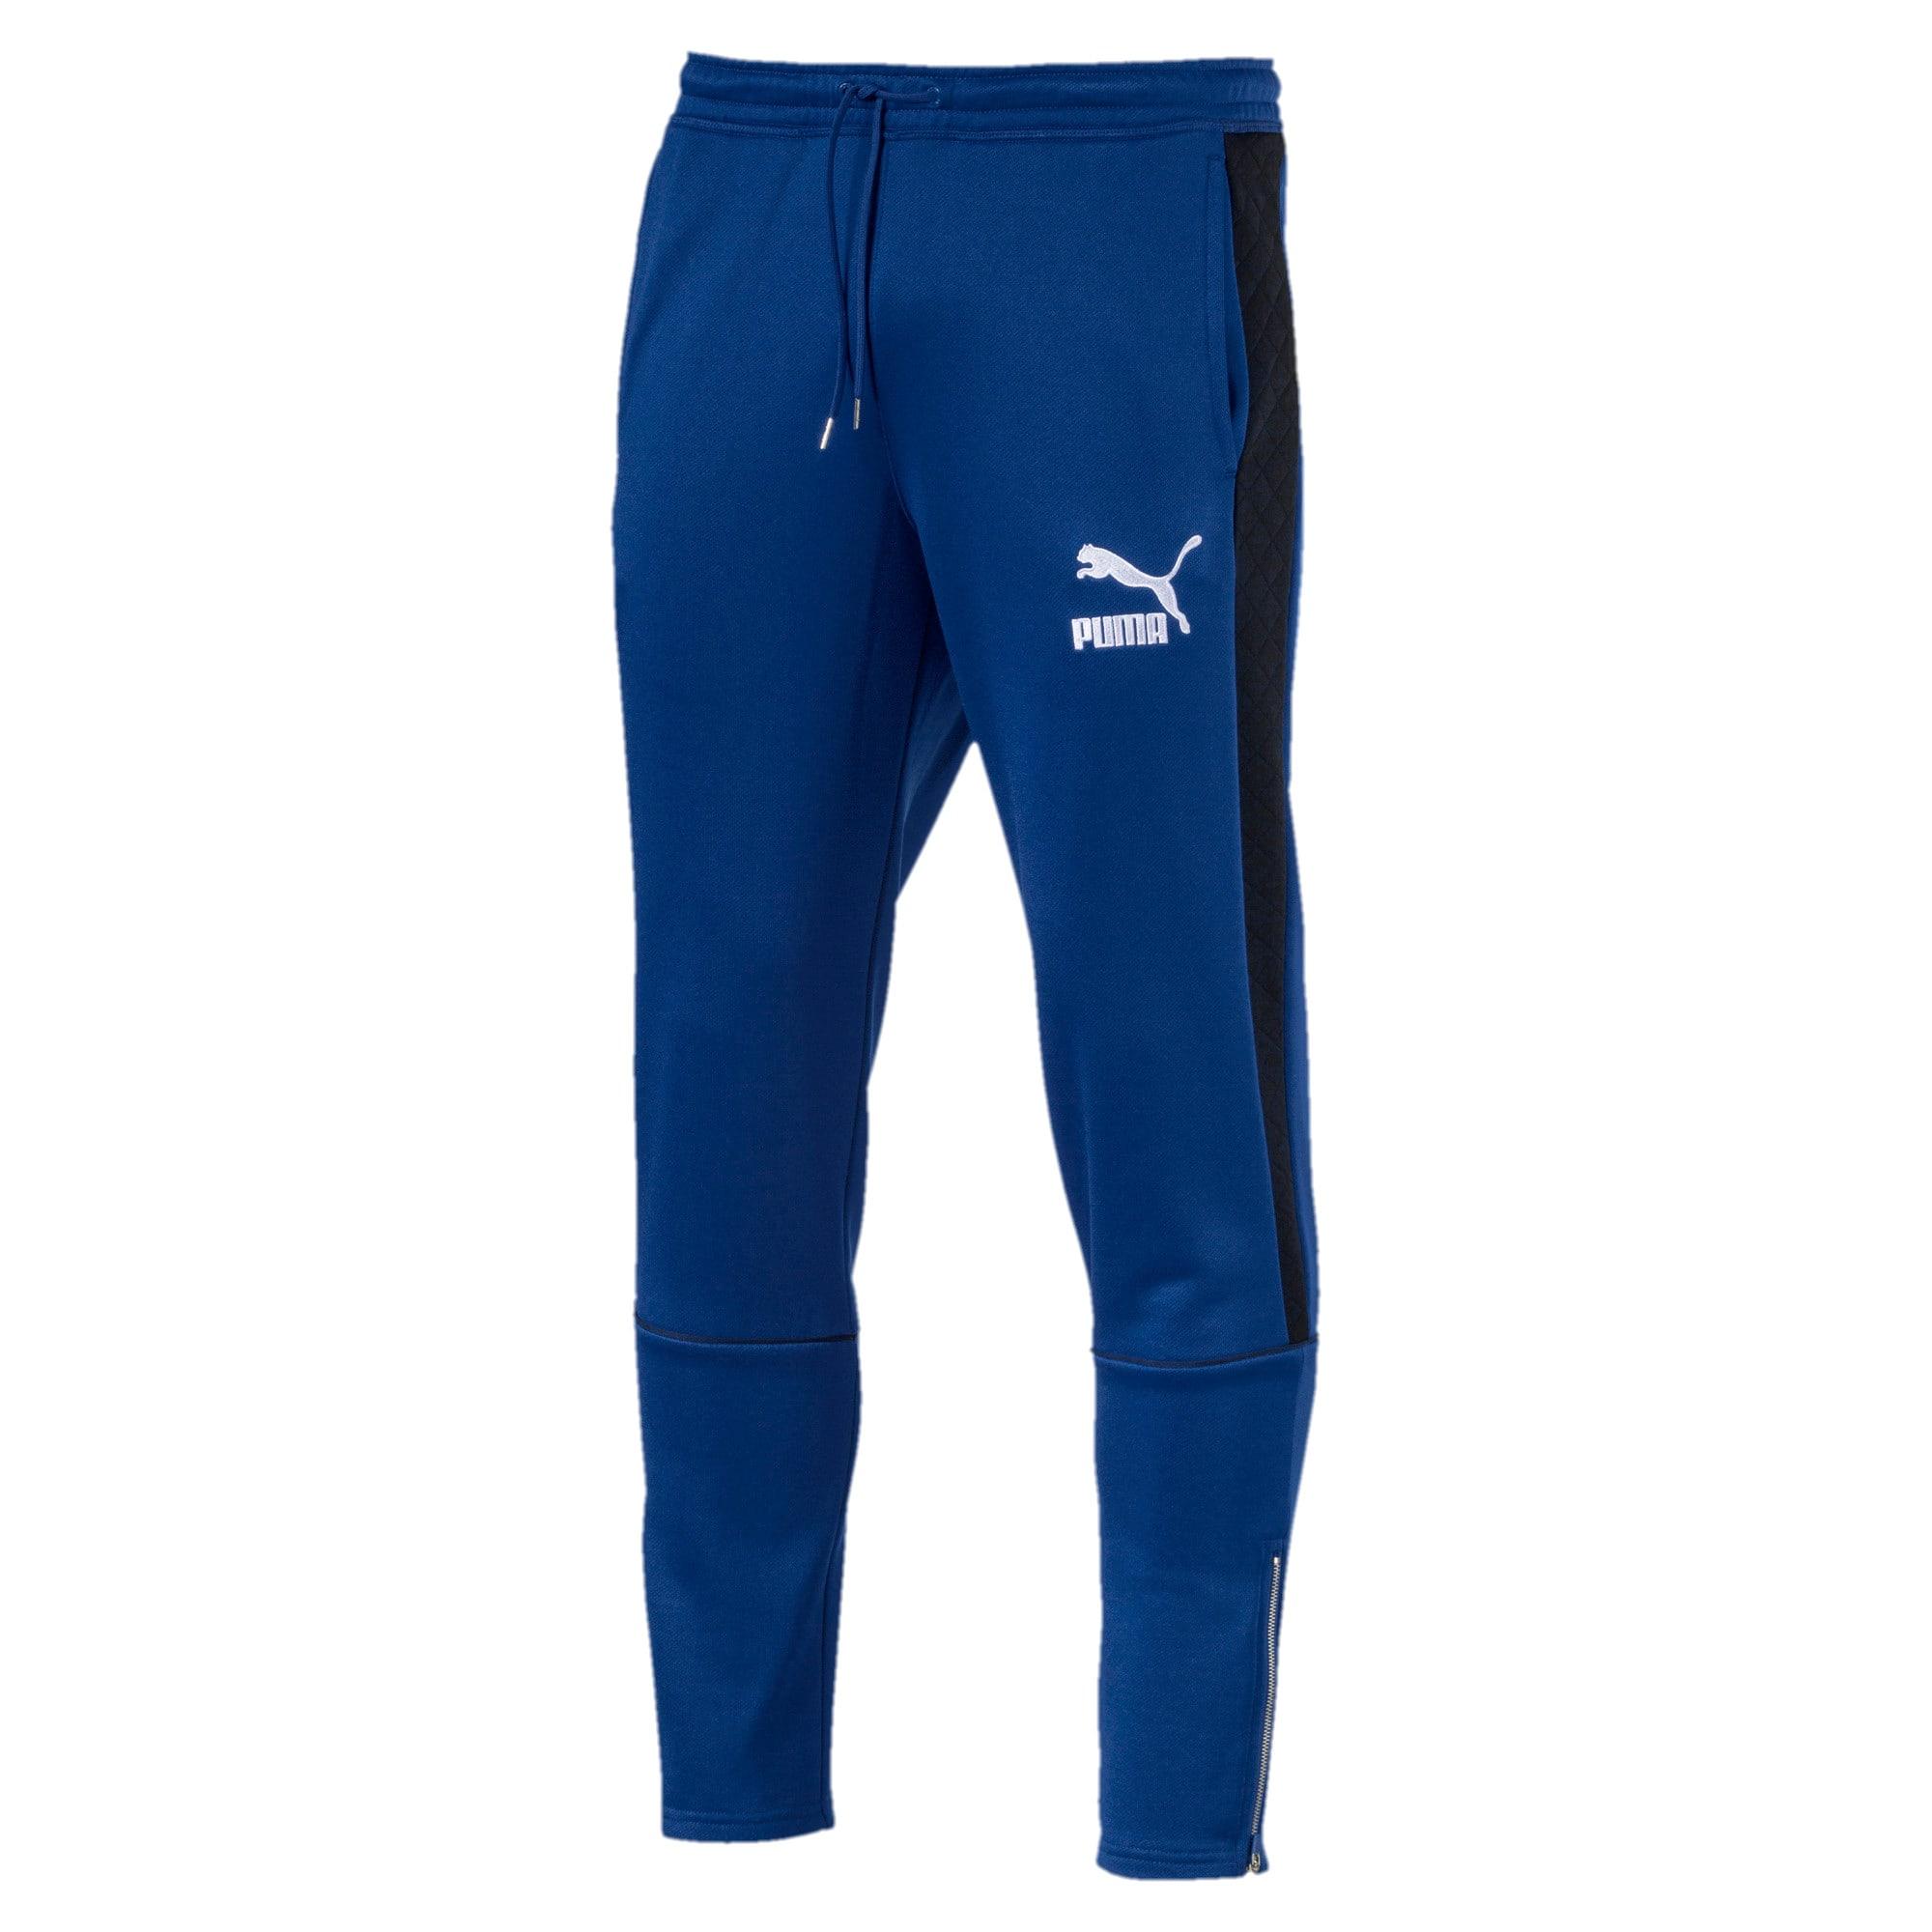 Thumbnail 1 of Archive Retro Quilted Men's Sweatpants, Sodalite Blue, medium